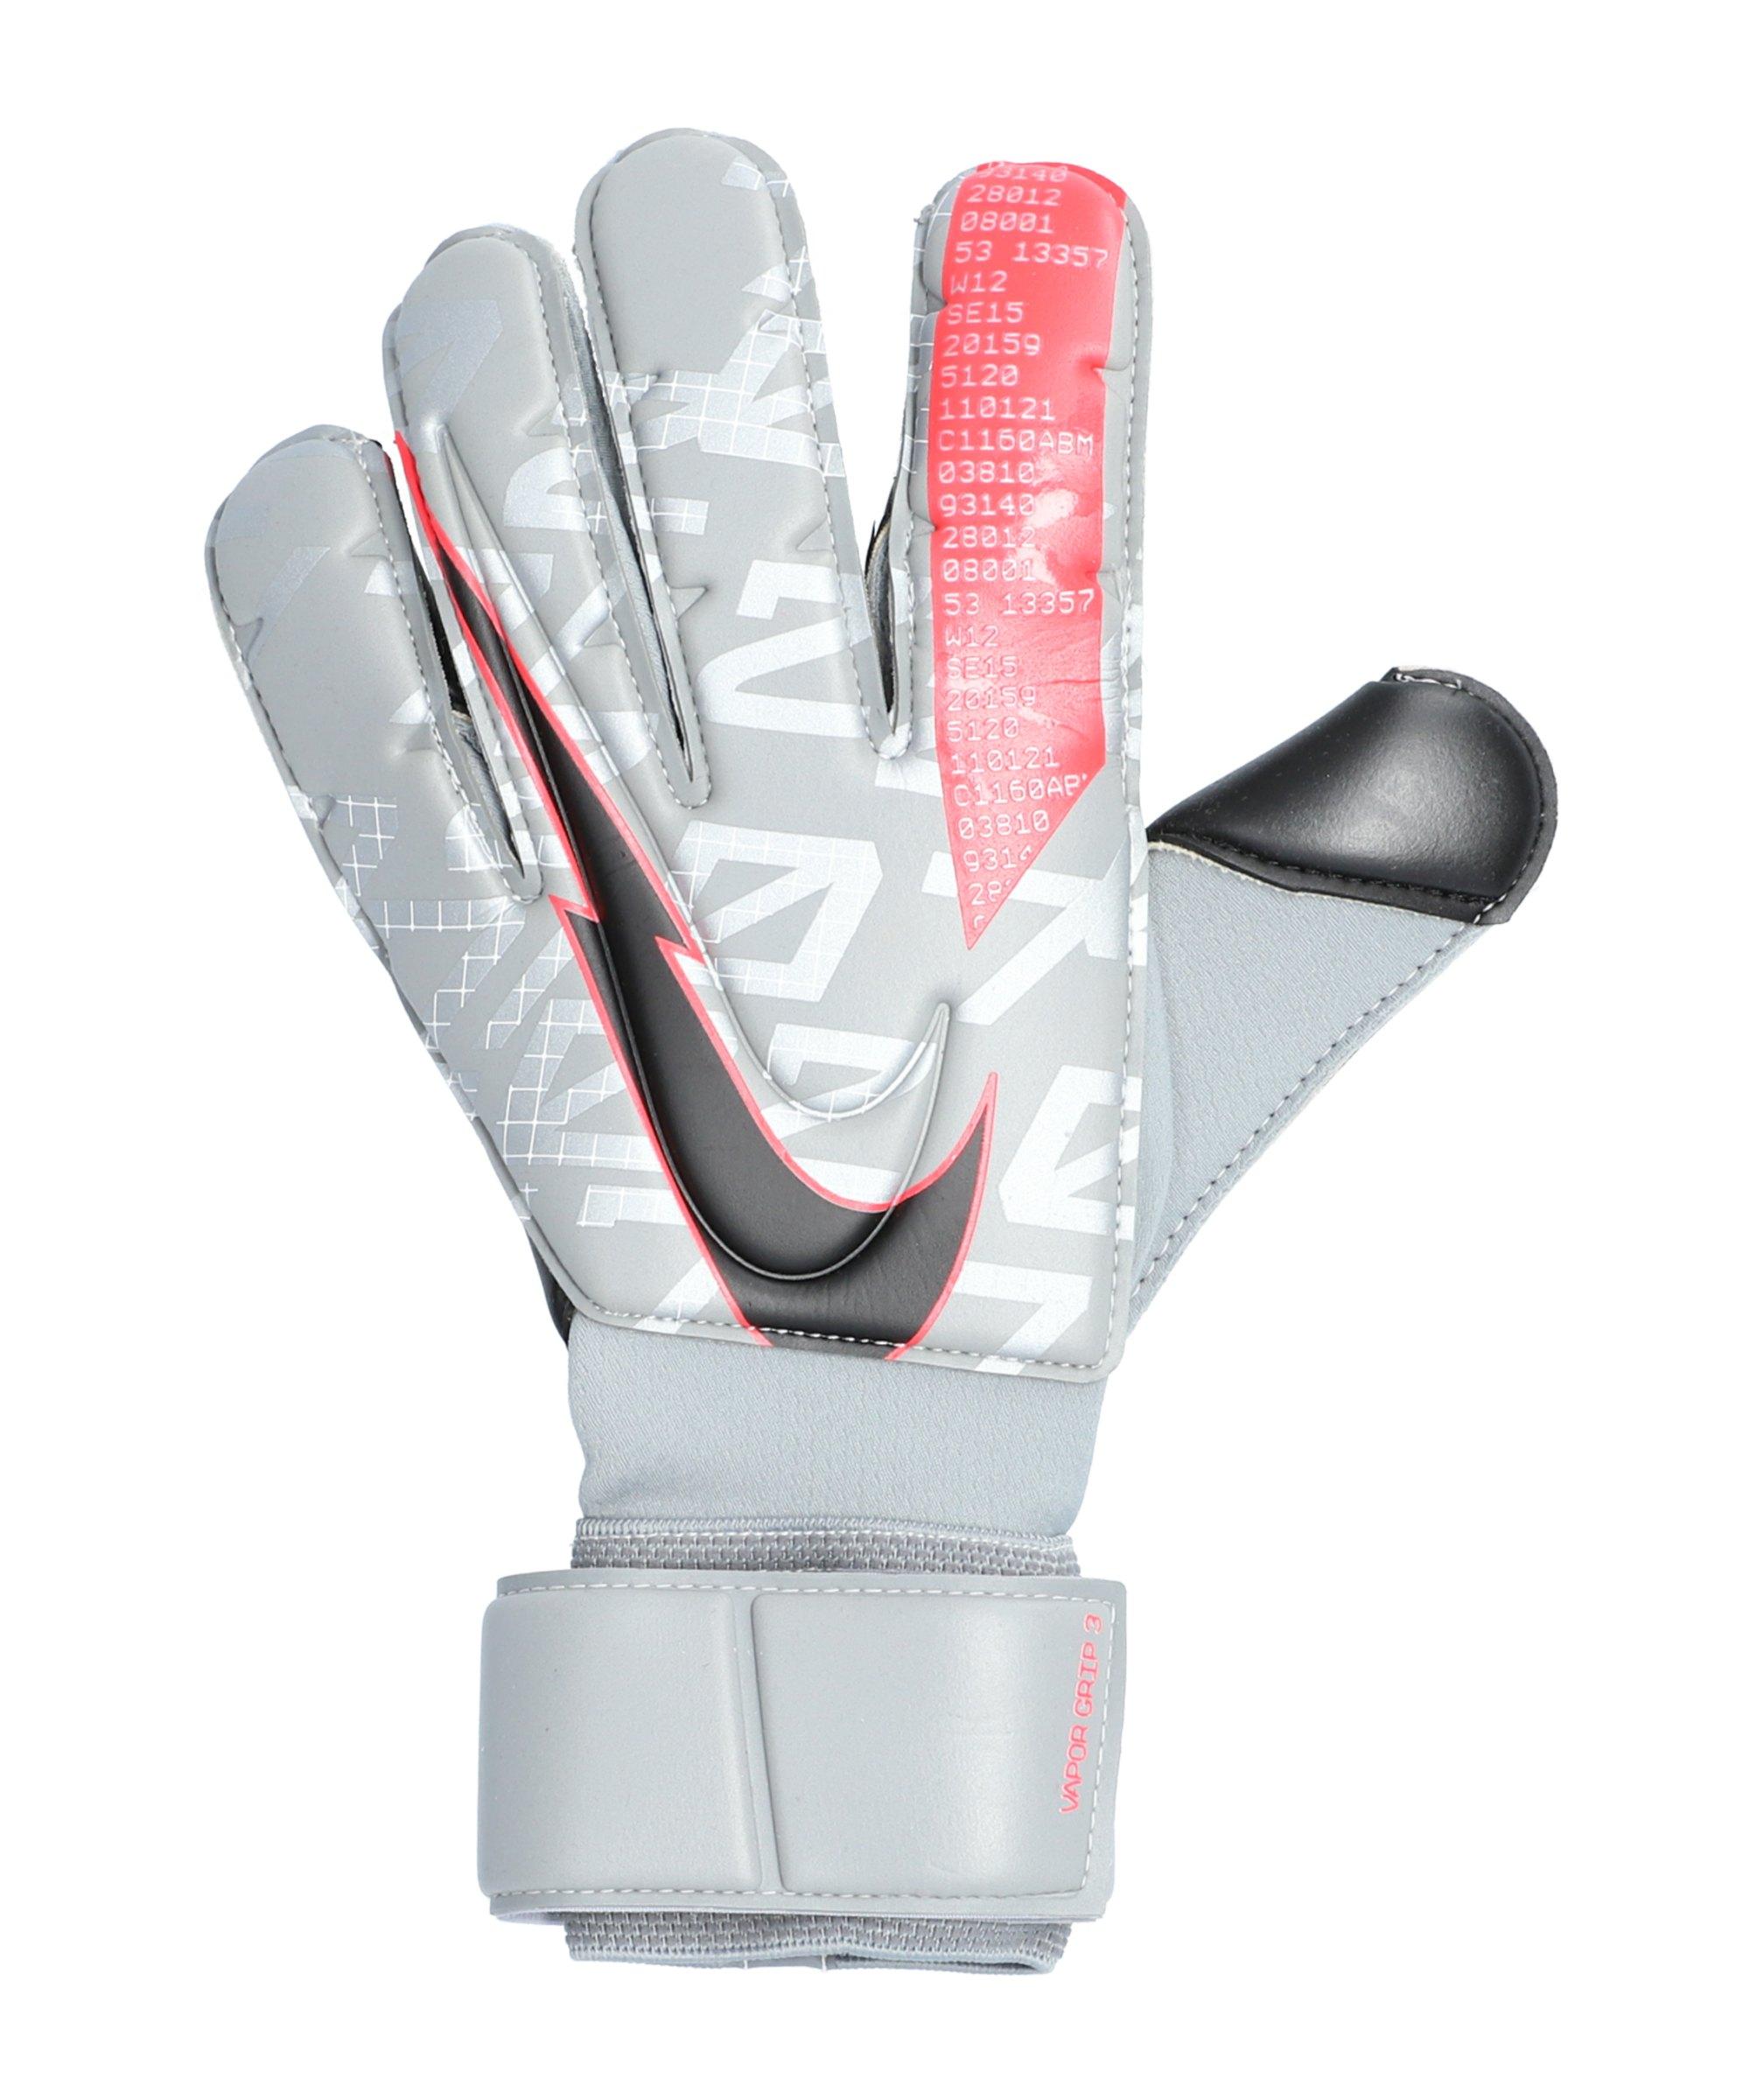 Nike Vapor Grip 3 Torwarthandschuh F073 - grau